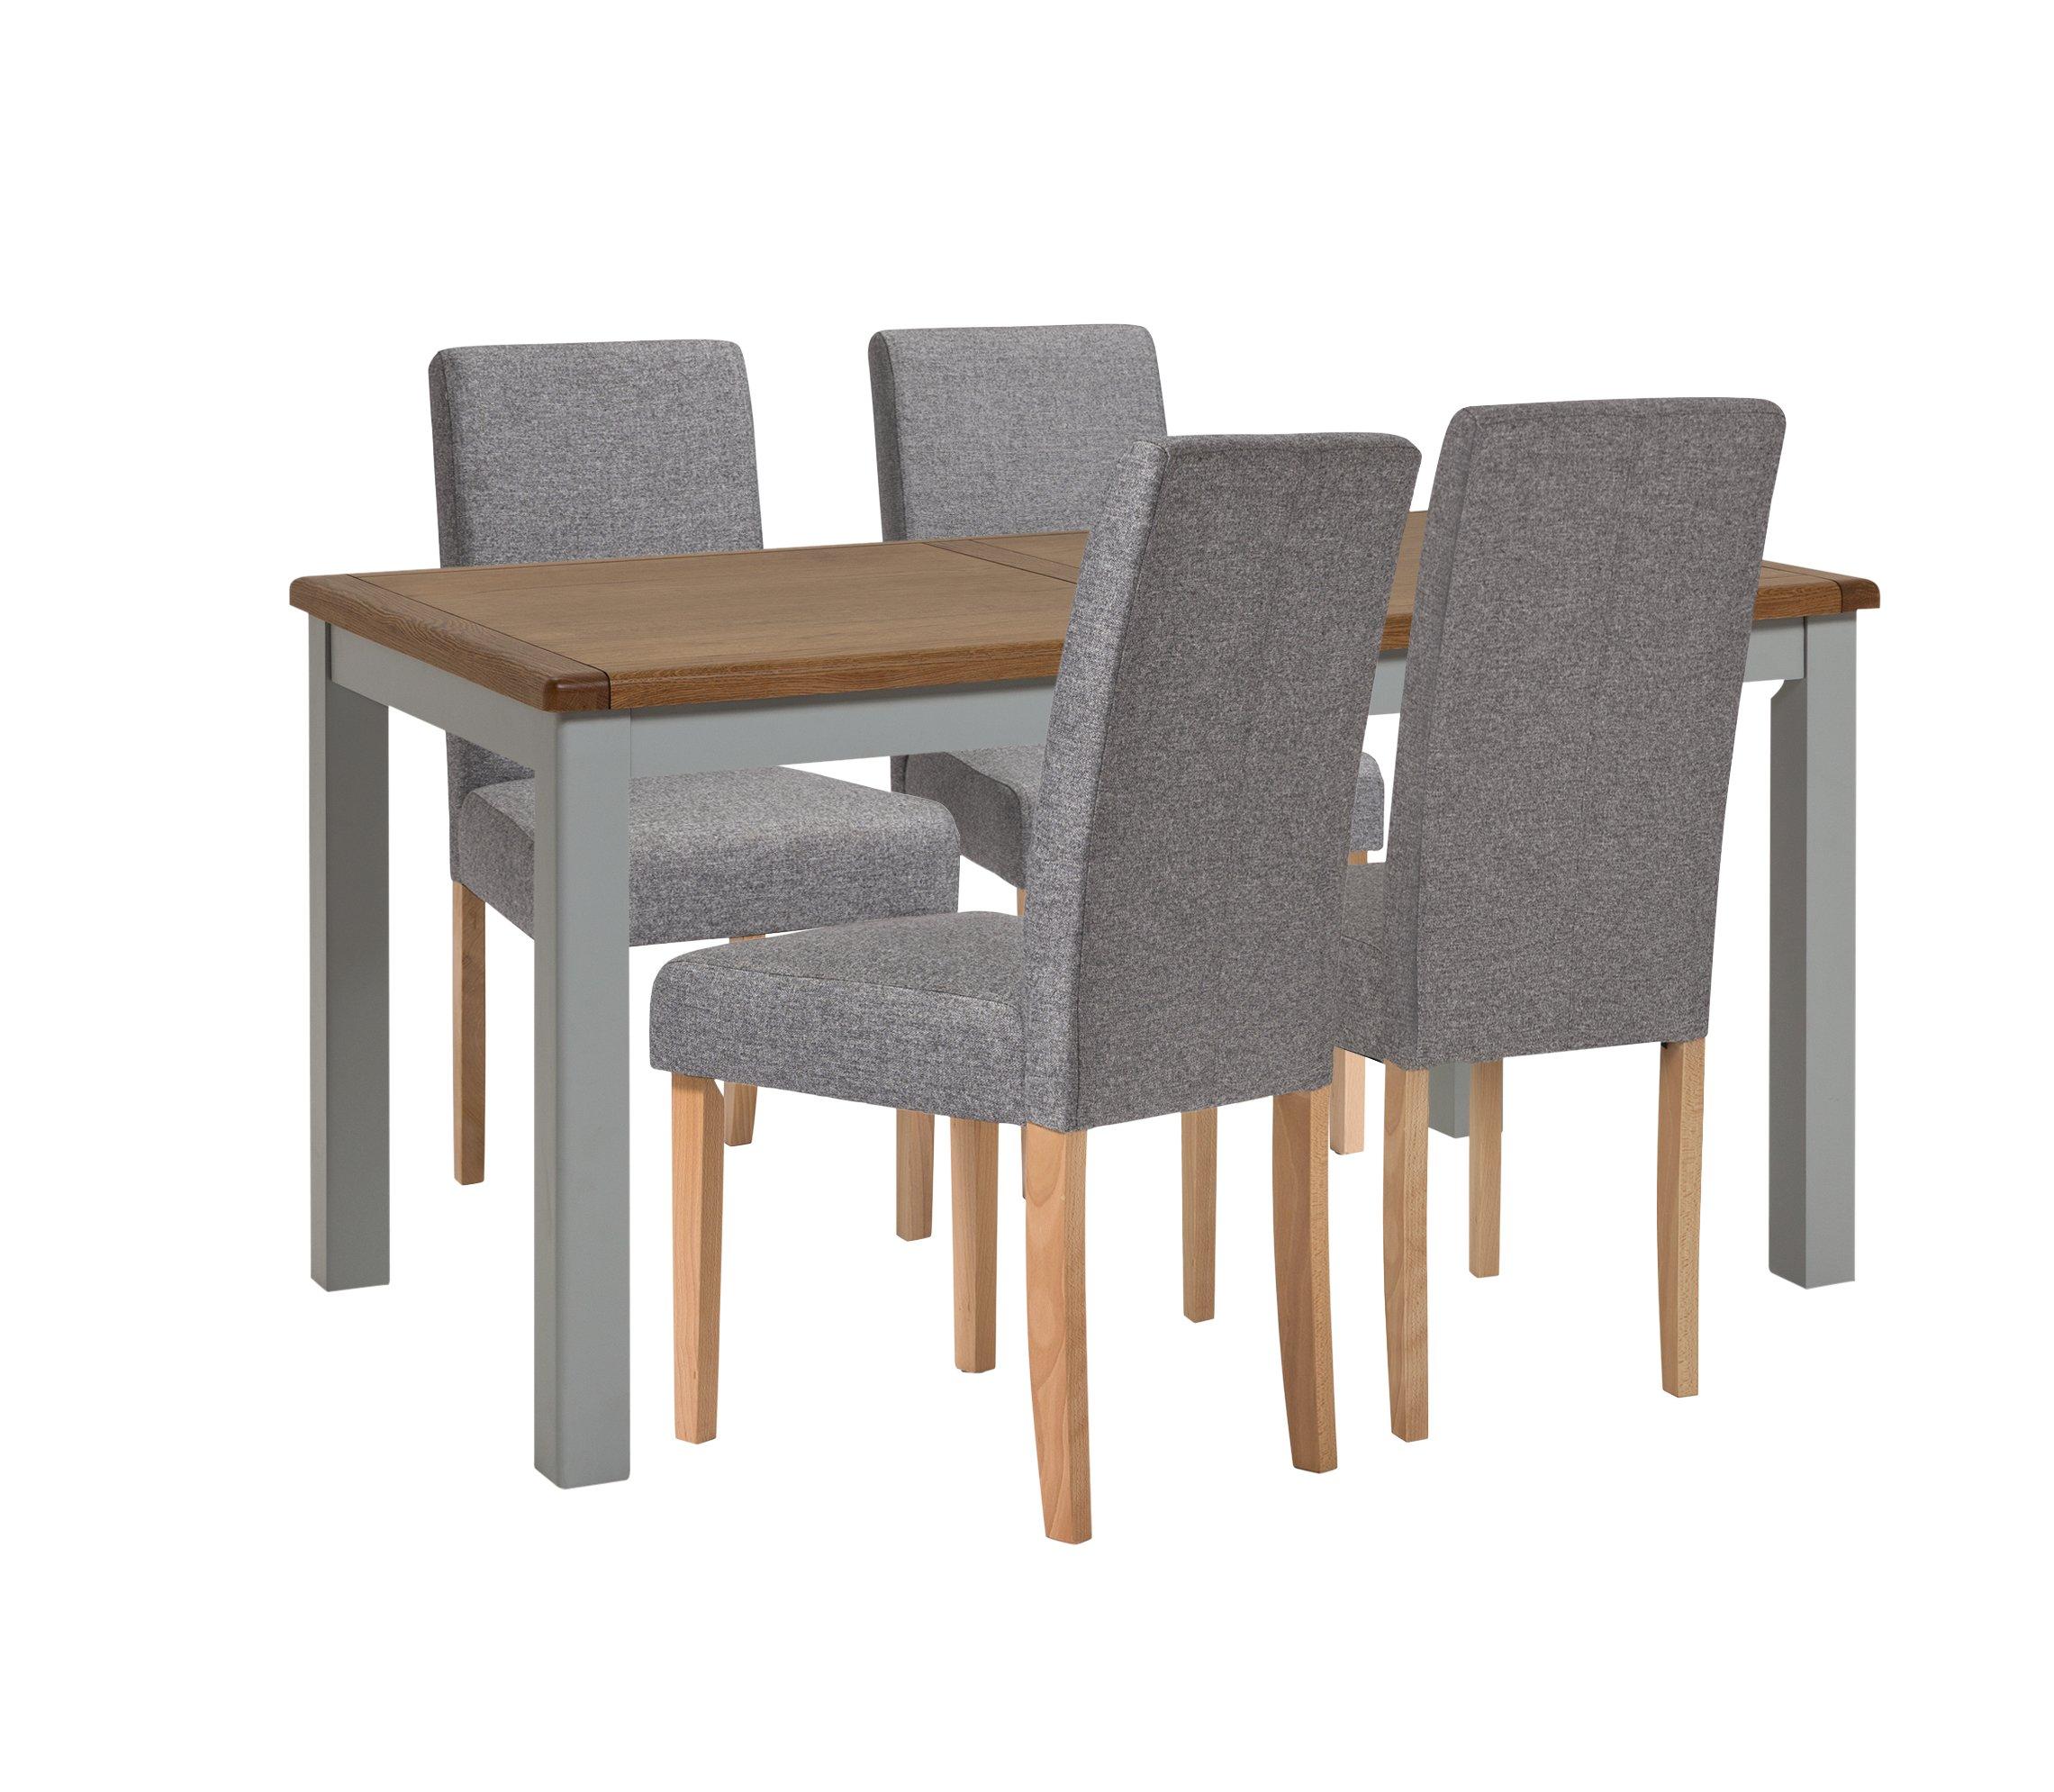 Habitat Kent Wood Veneer Dining Table & 4 Grey Chairs